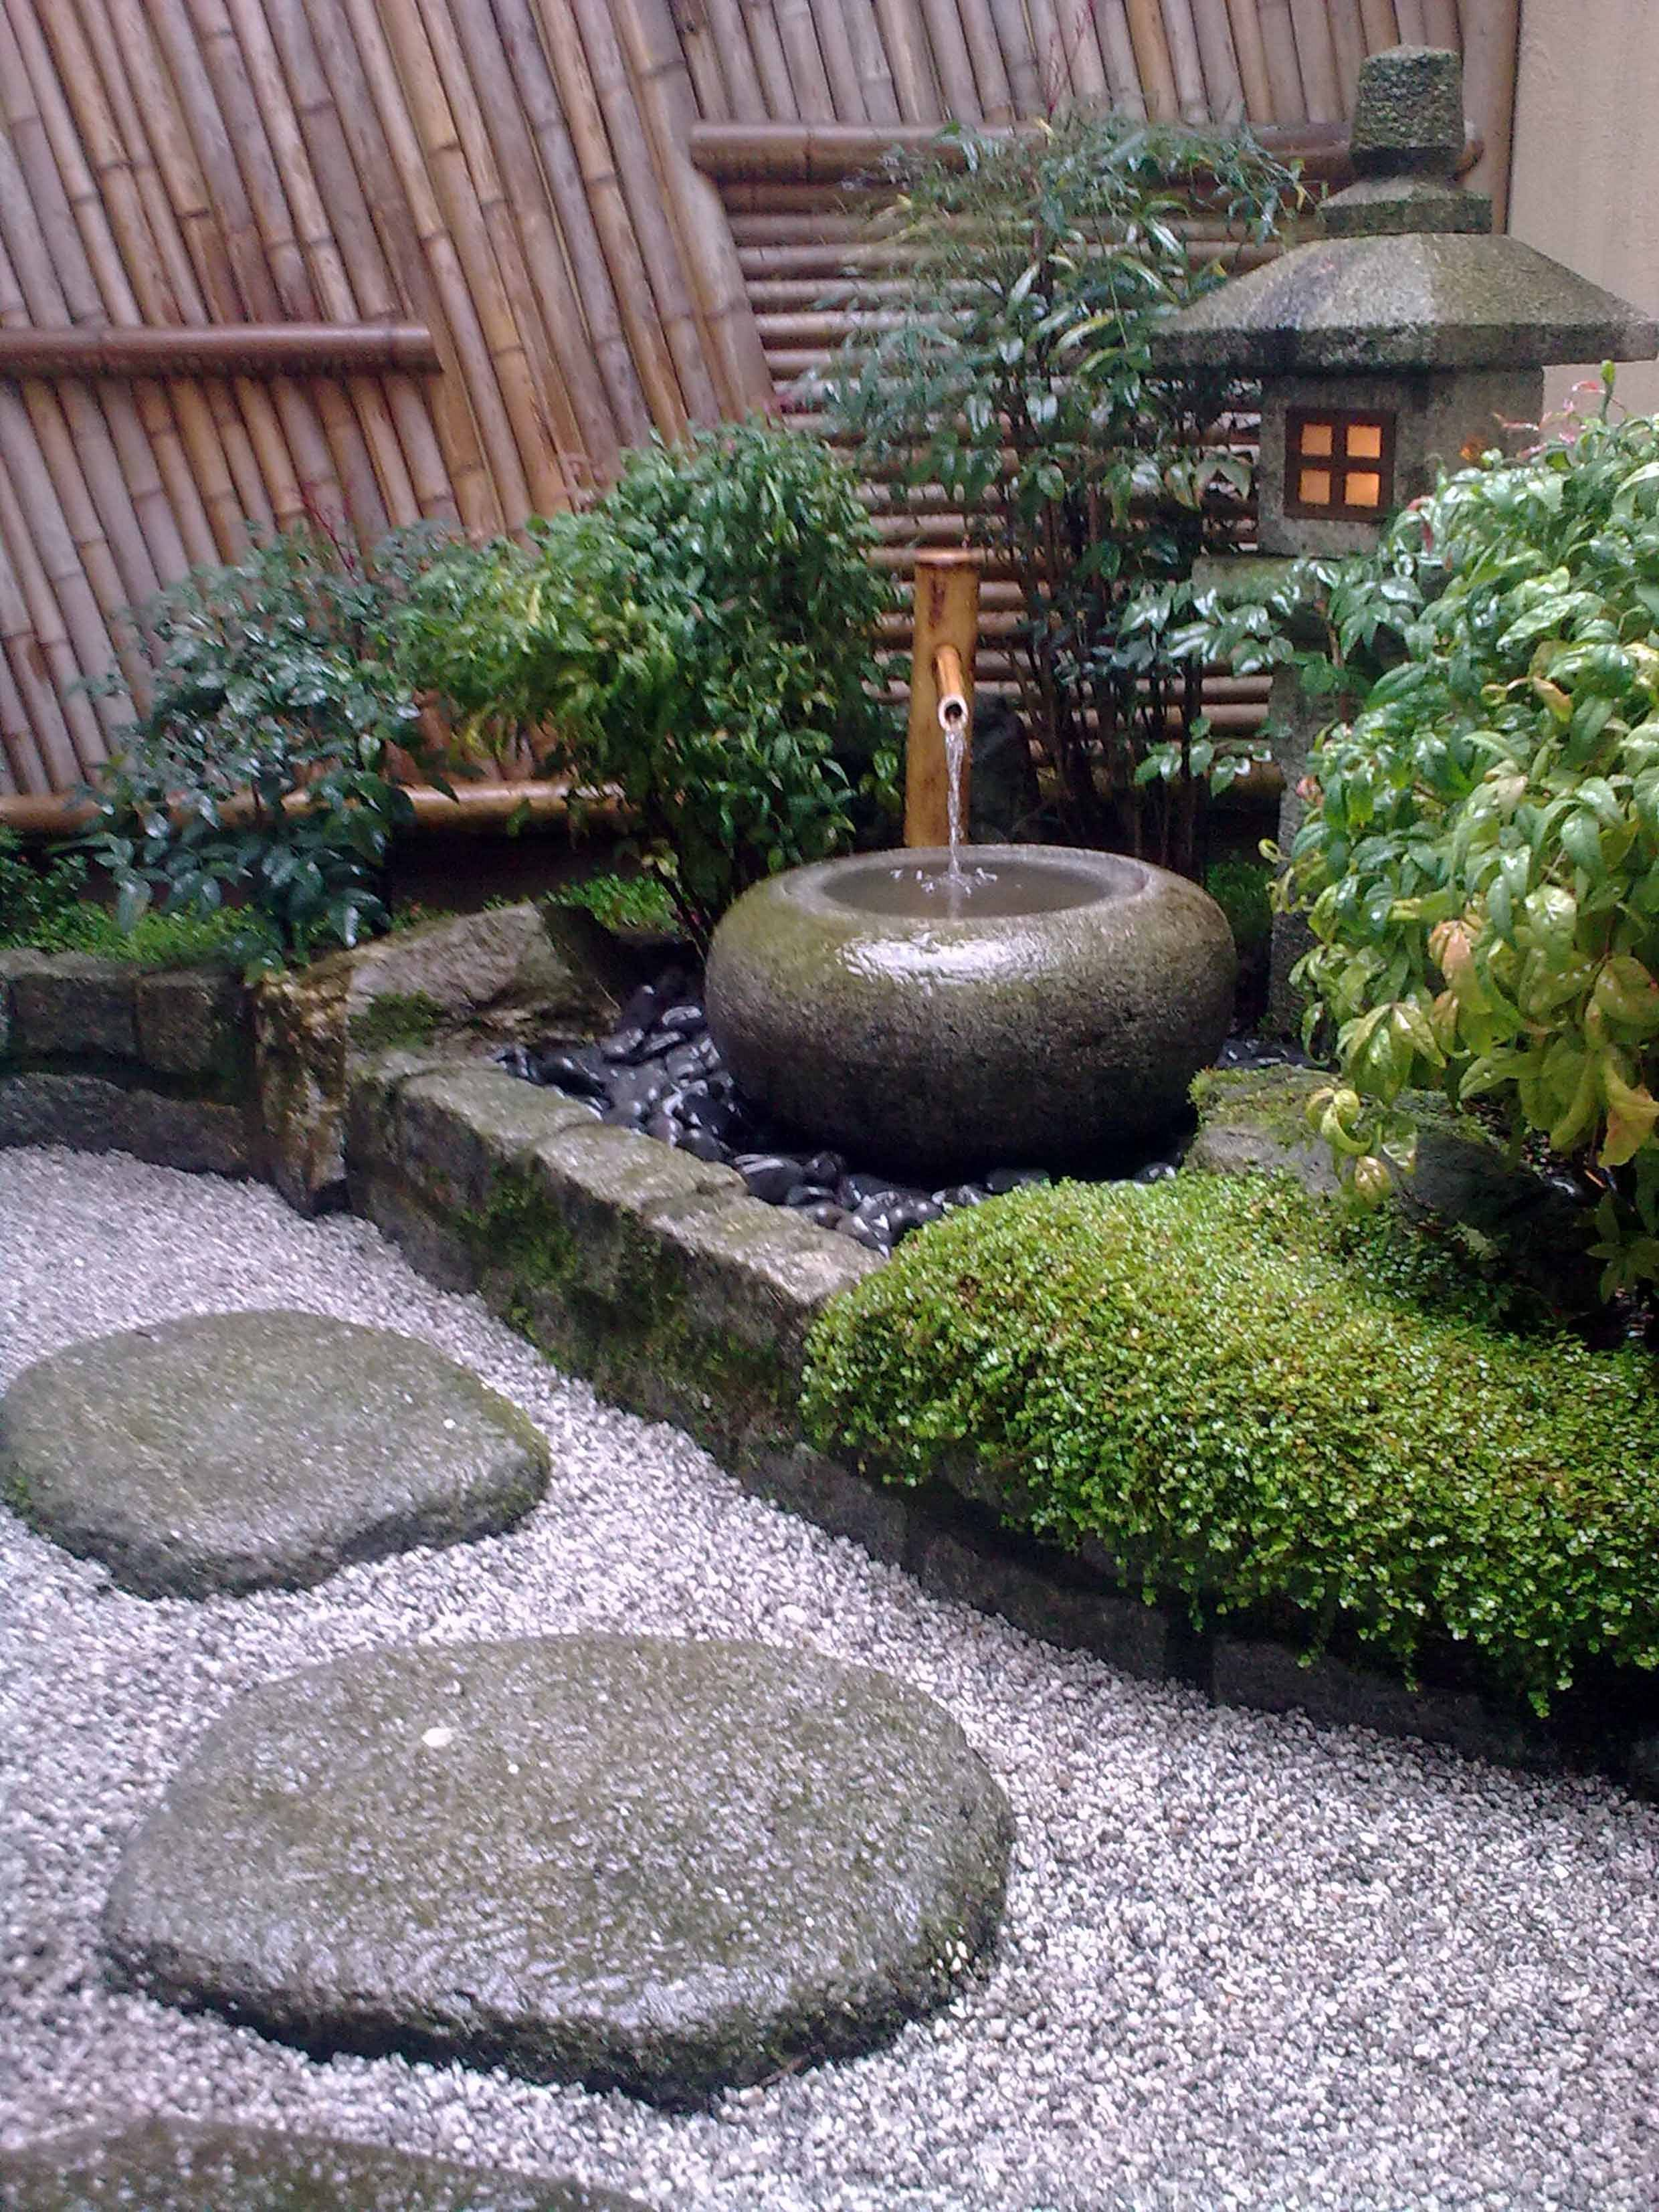 76 Beautiful Zen Garden Ideas For Backyard 400 Small